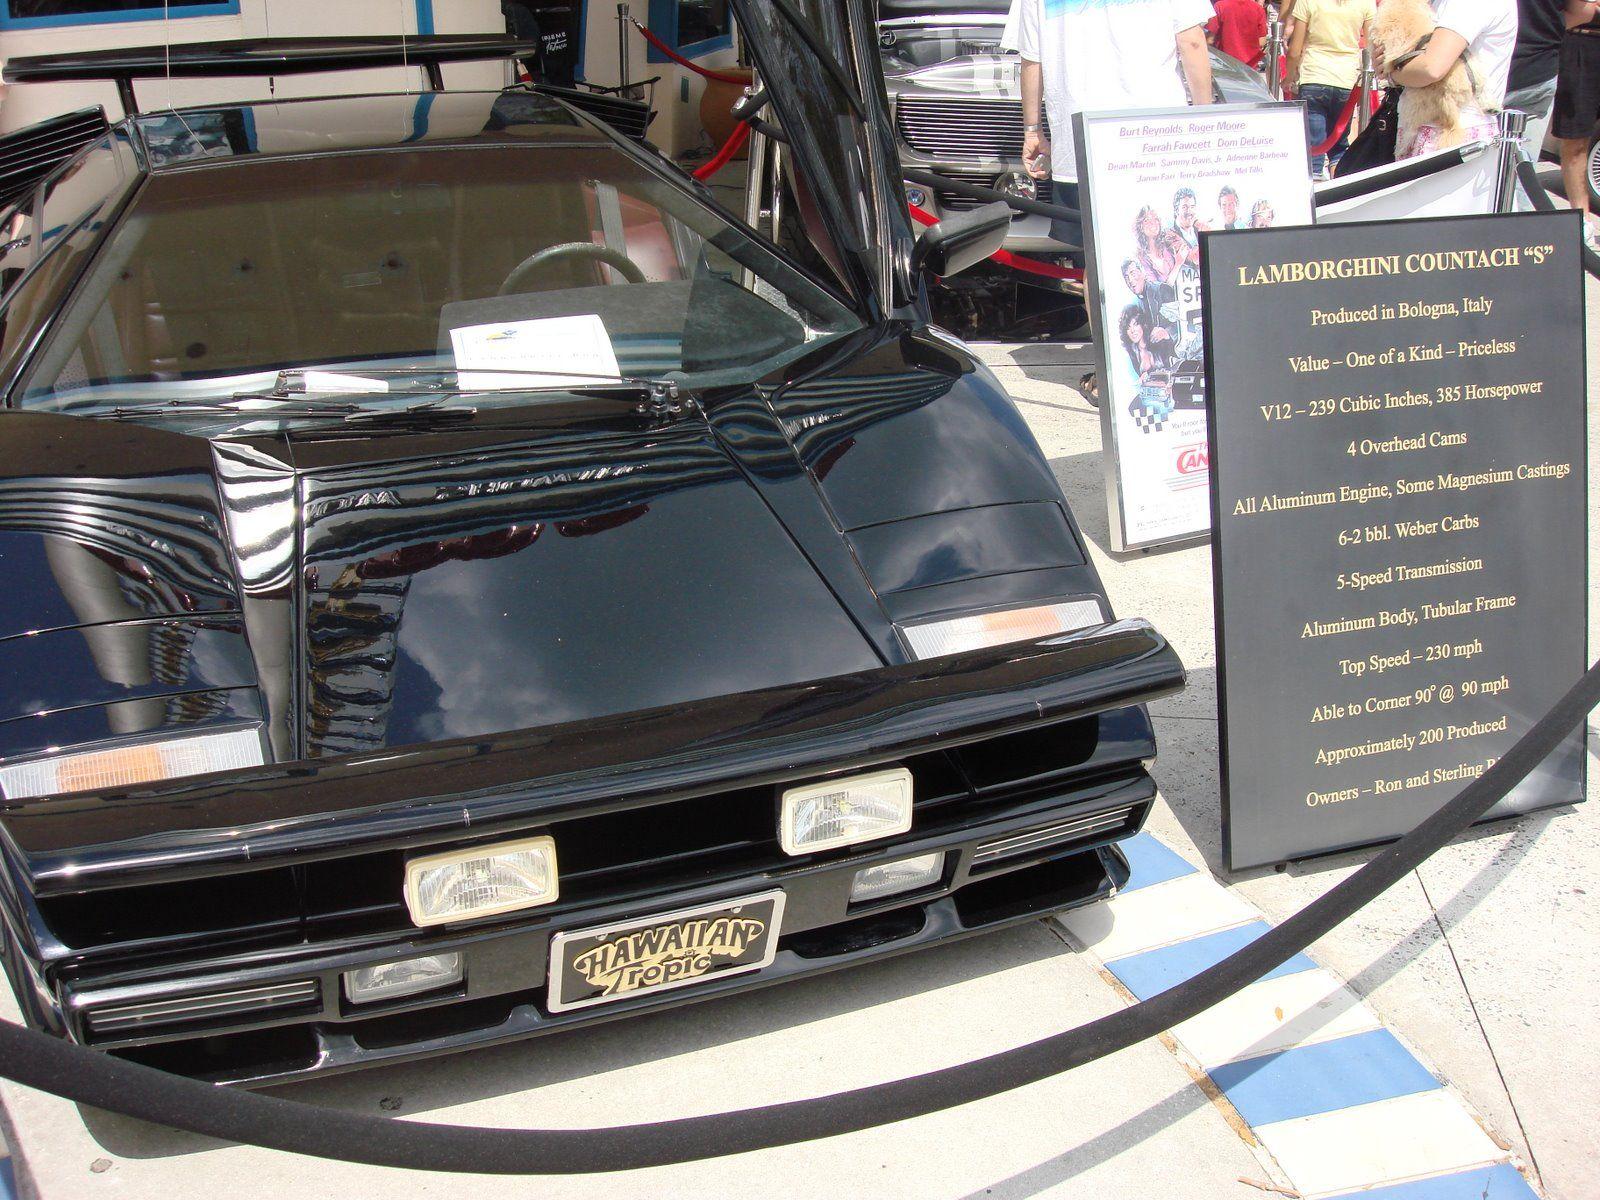 806fbd484ed135295474f2dac2ce9760 Astounding Lamborghini Countach Built In Basement Cars Trend